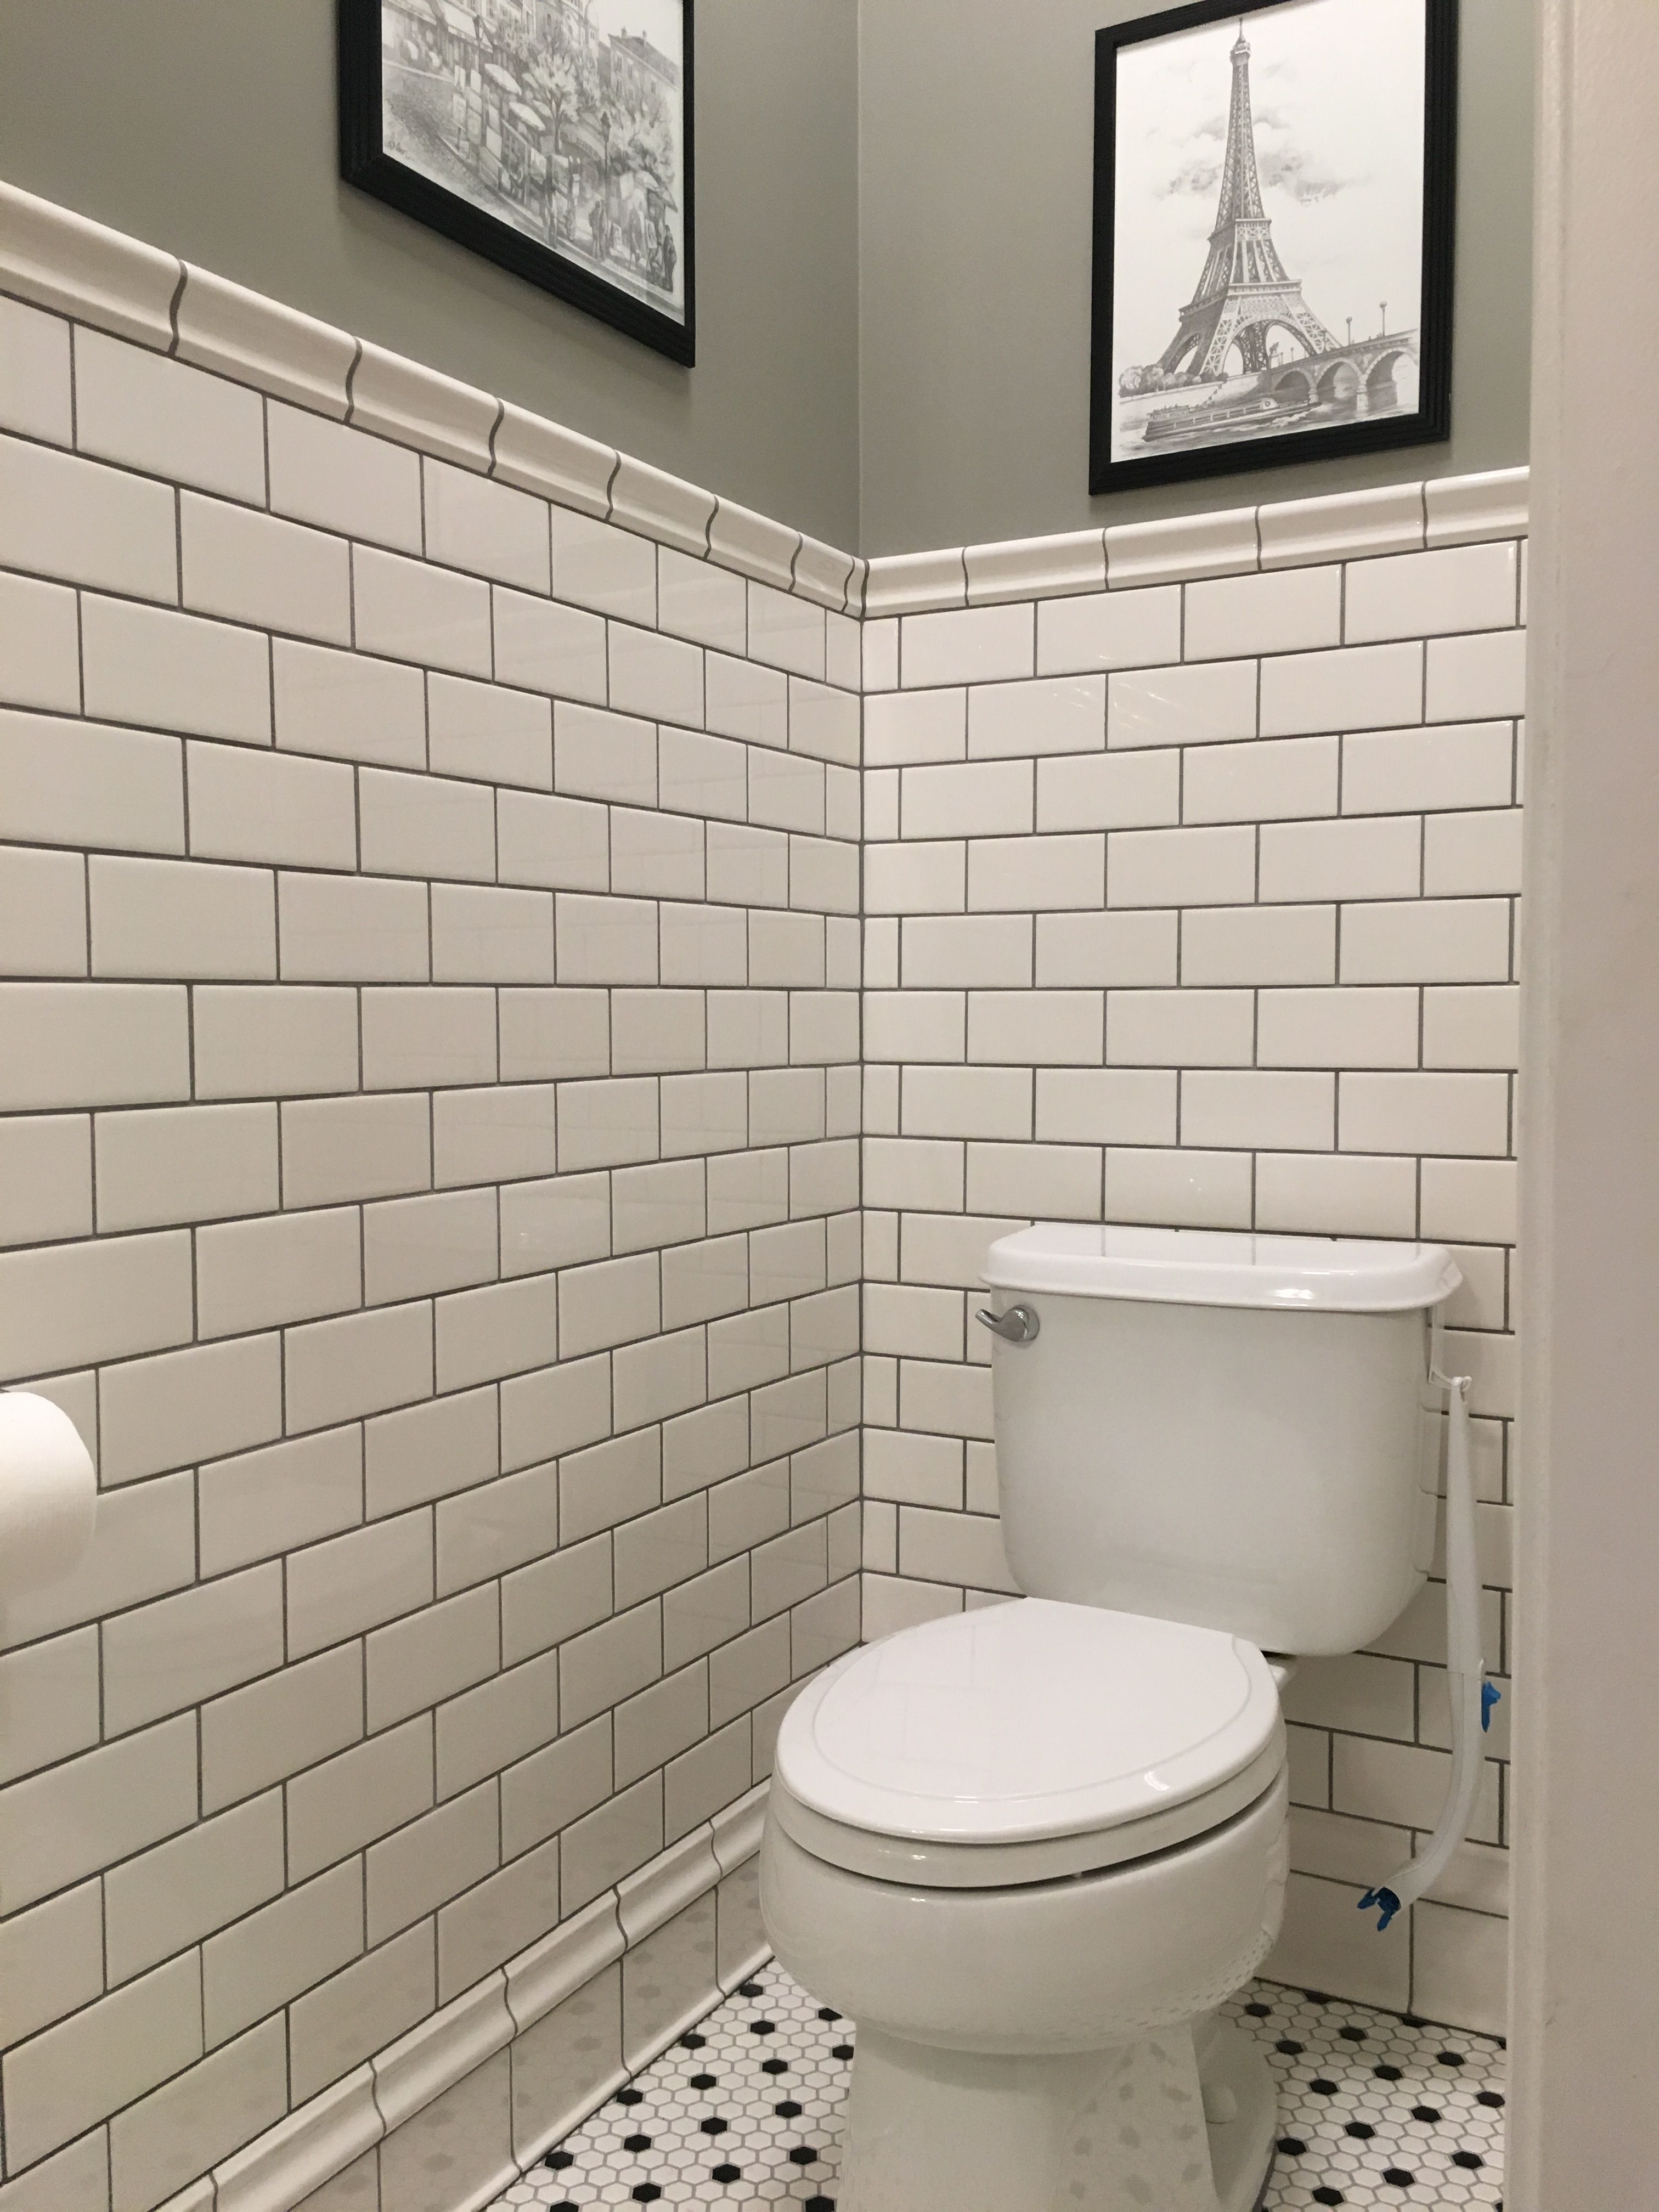 My 1 2 Bath Remodel Subway Tile Bath Remodel Top Bathroom Design Bathrooms Remodel